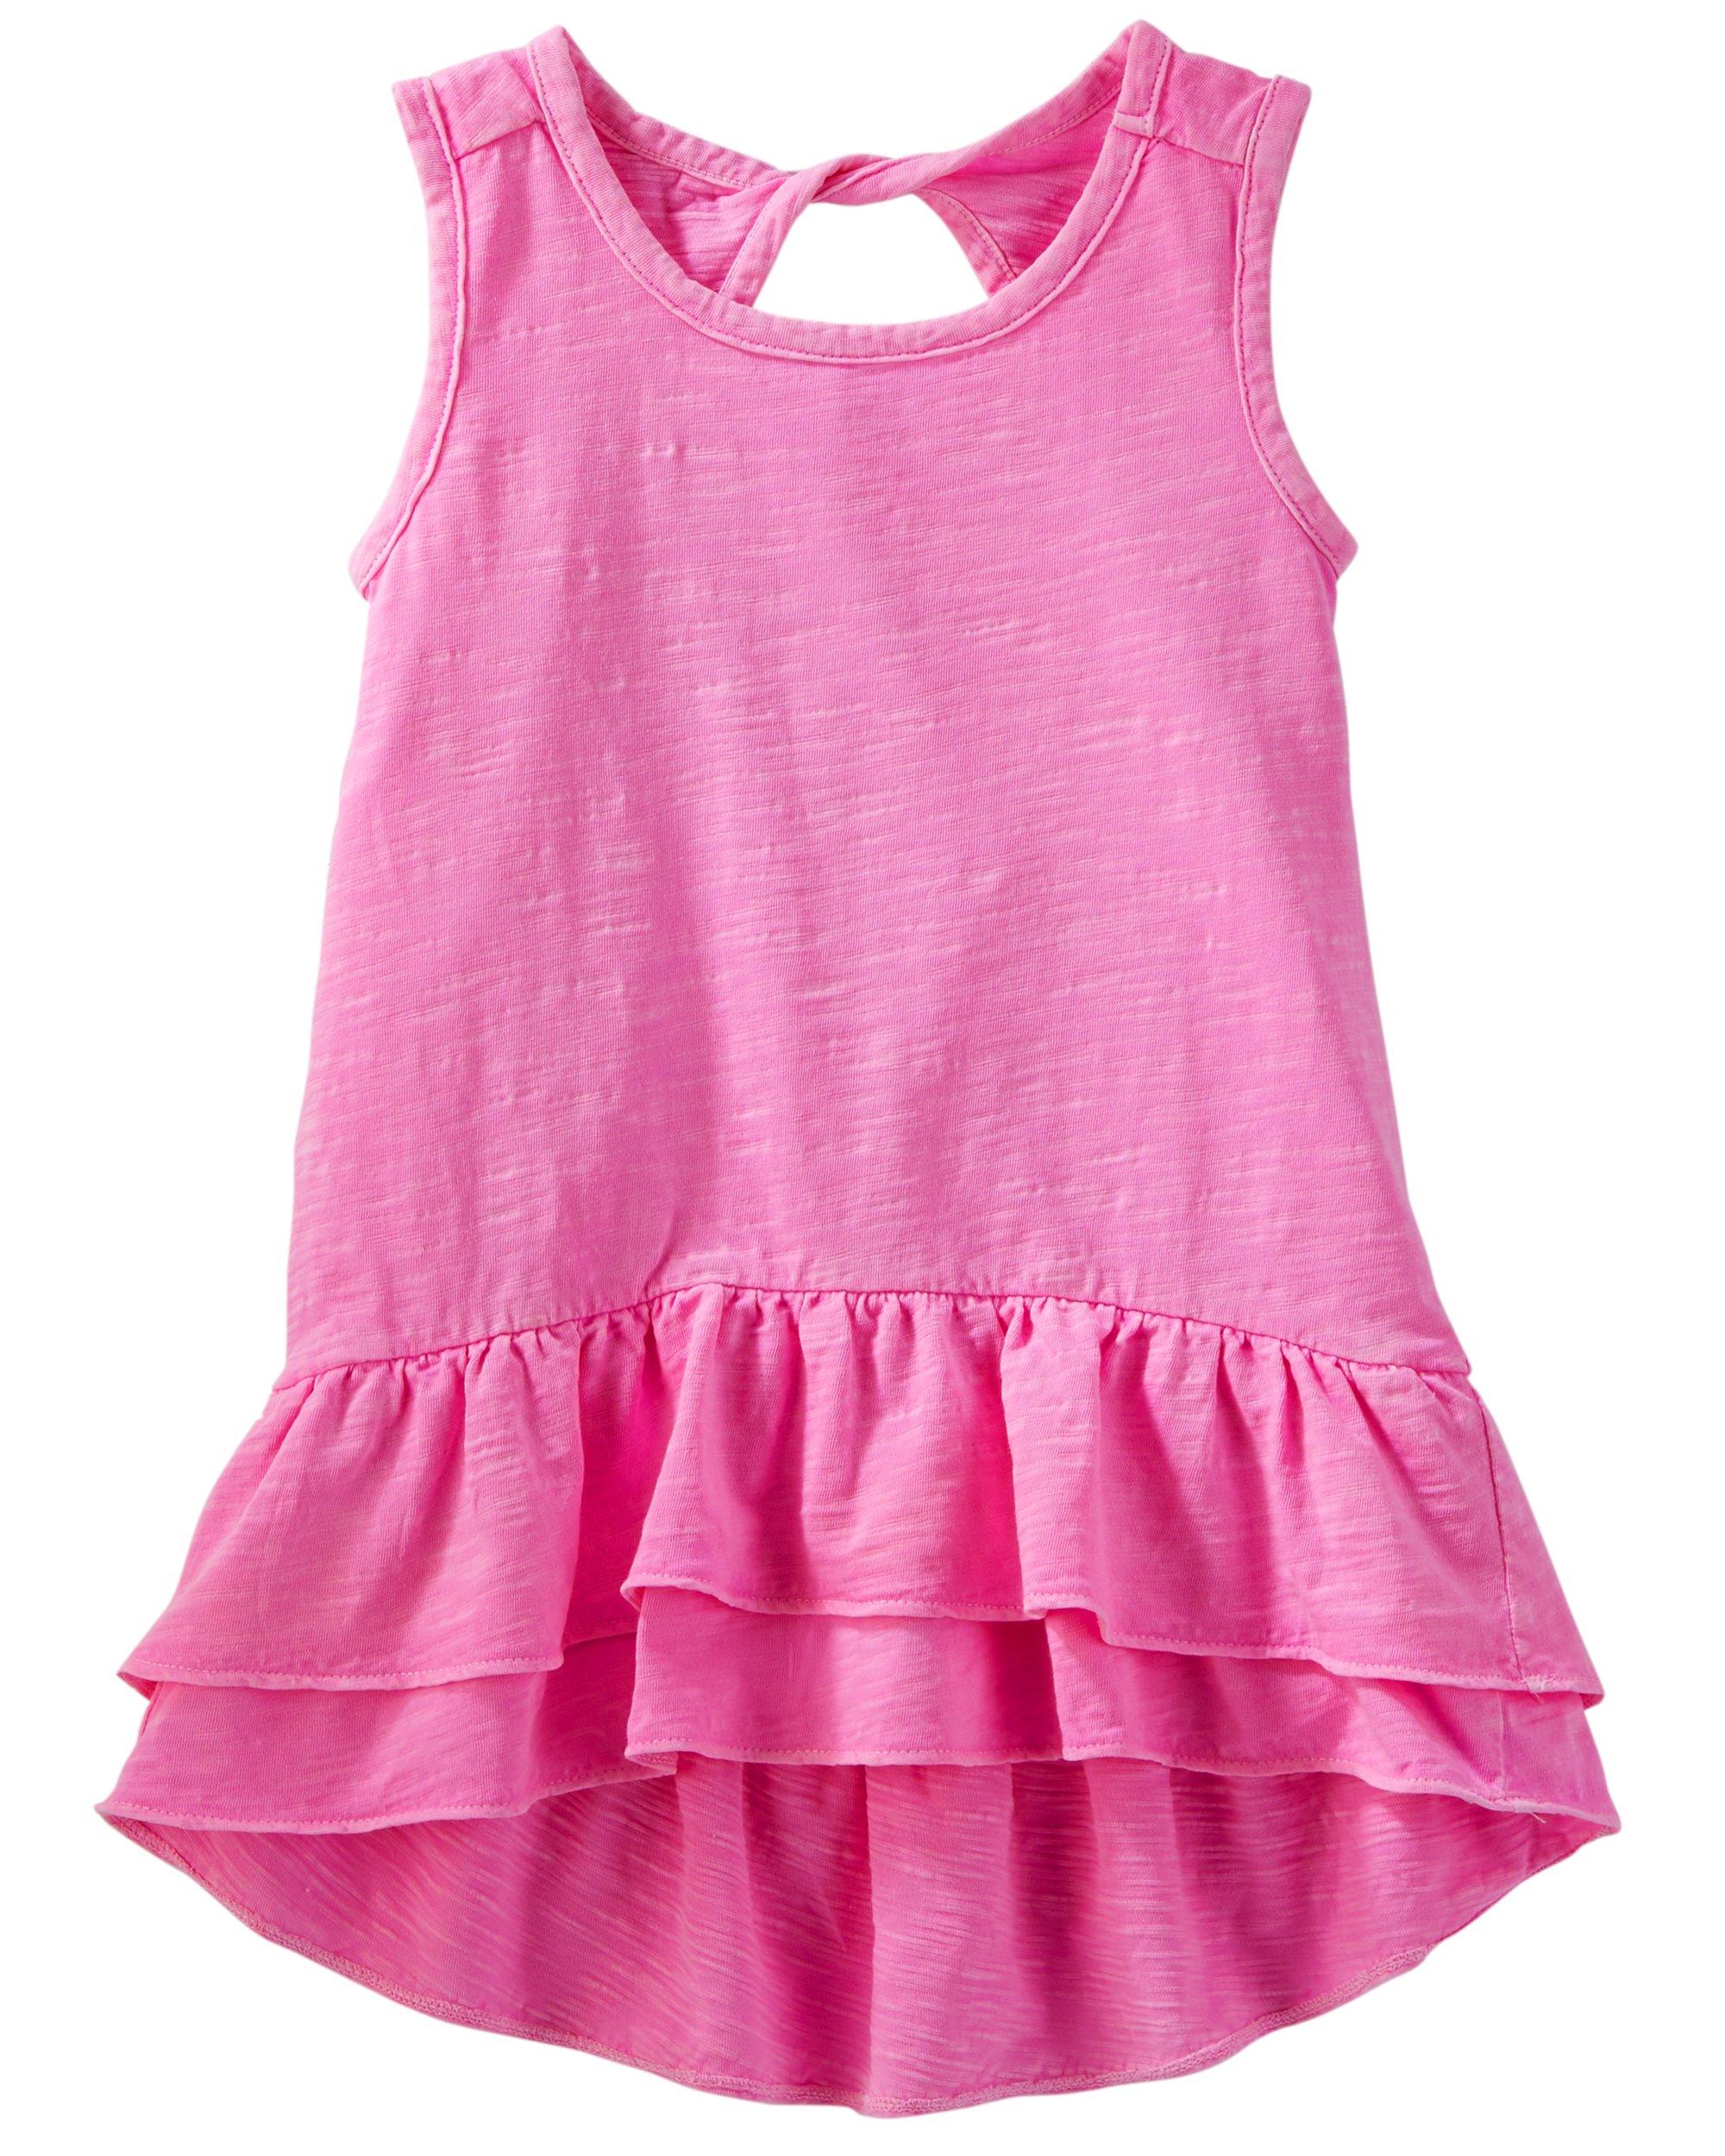 Osh Kosh Girls' Kids Short-Sleeve Knit